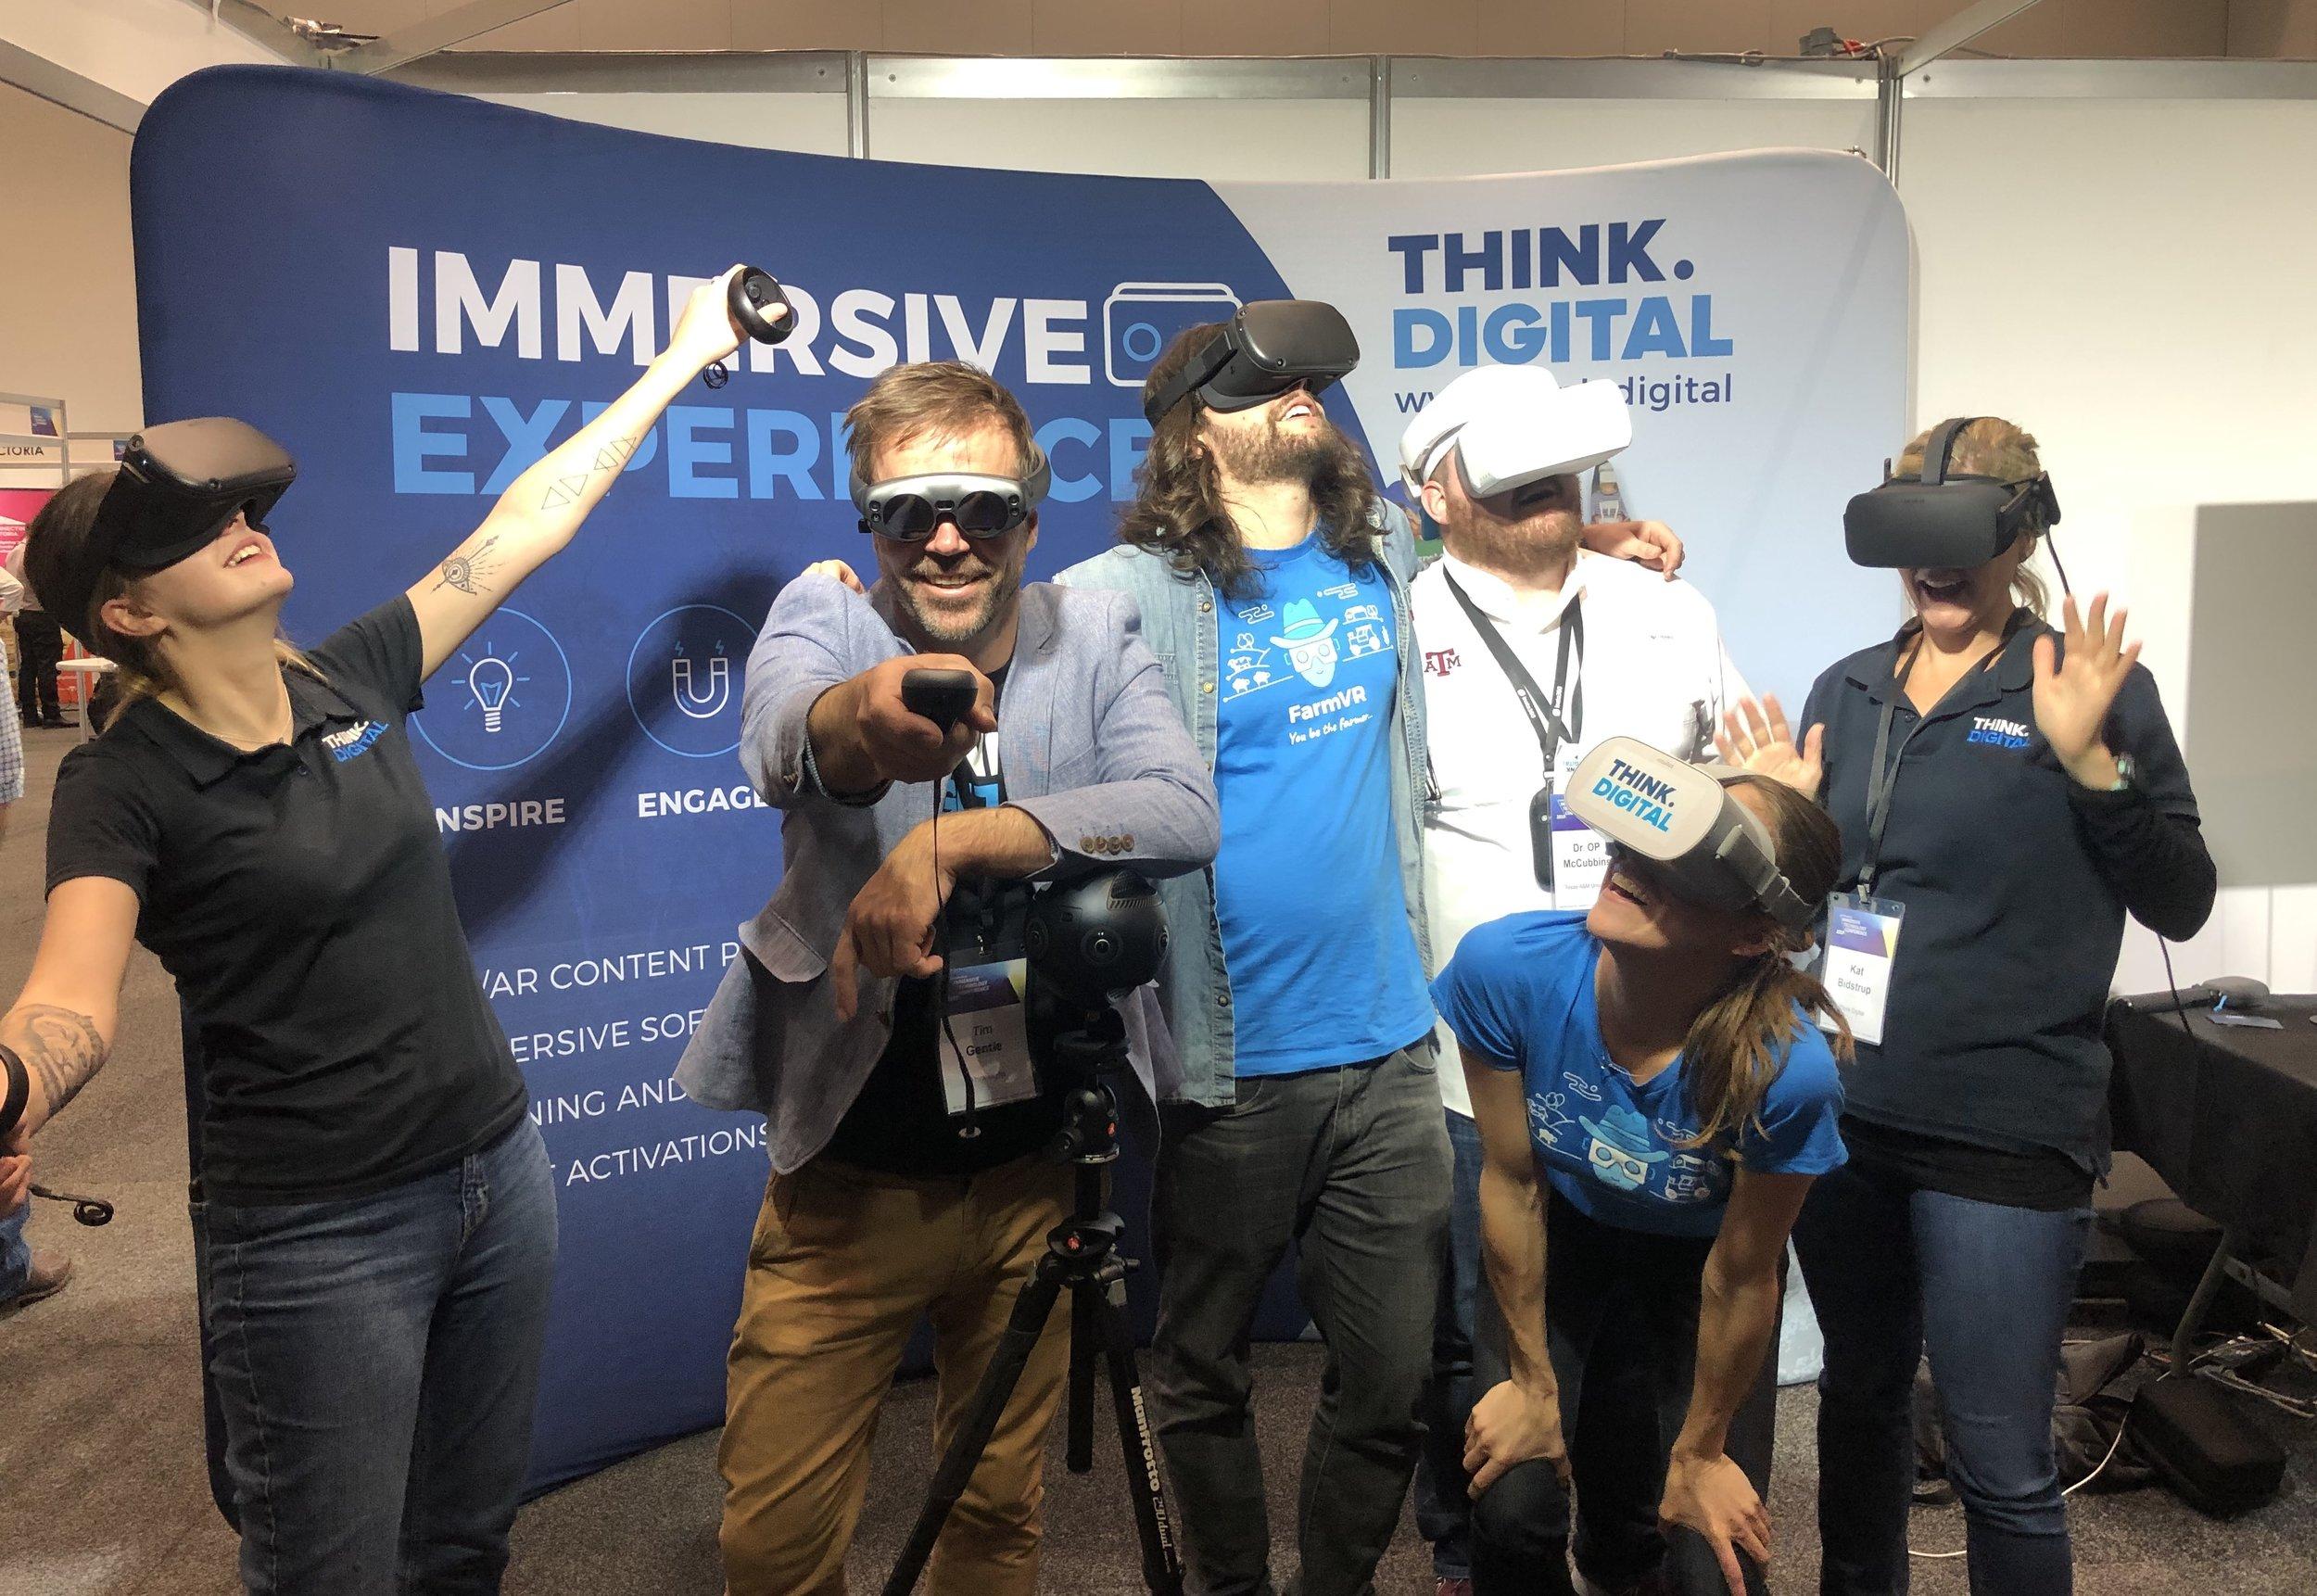 think-digital-team-ar-hackathon-arvra.jpg